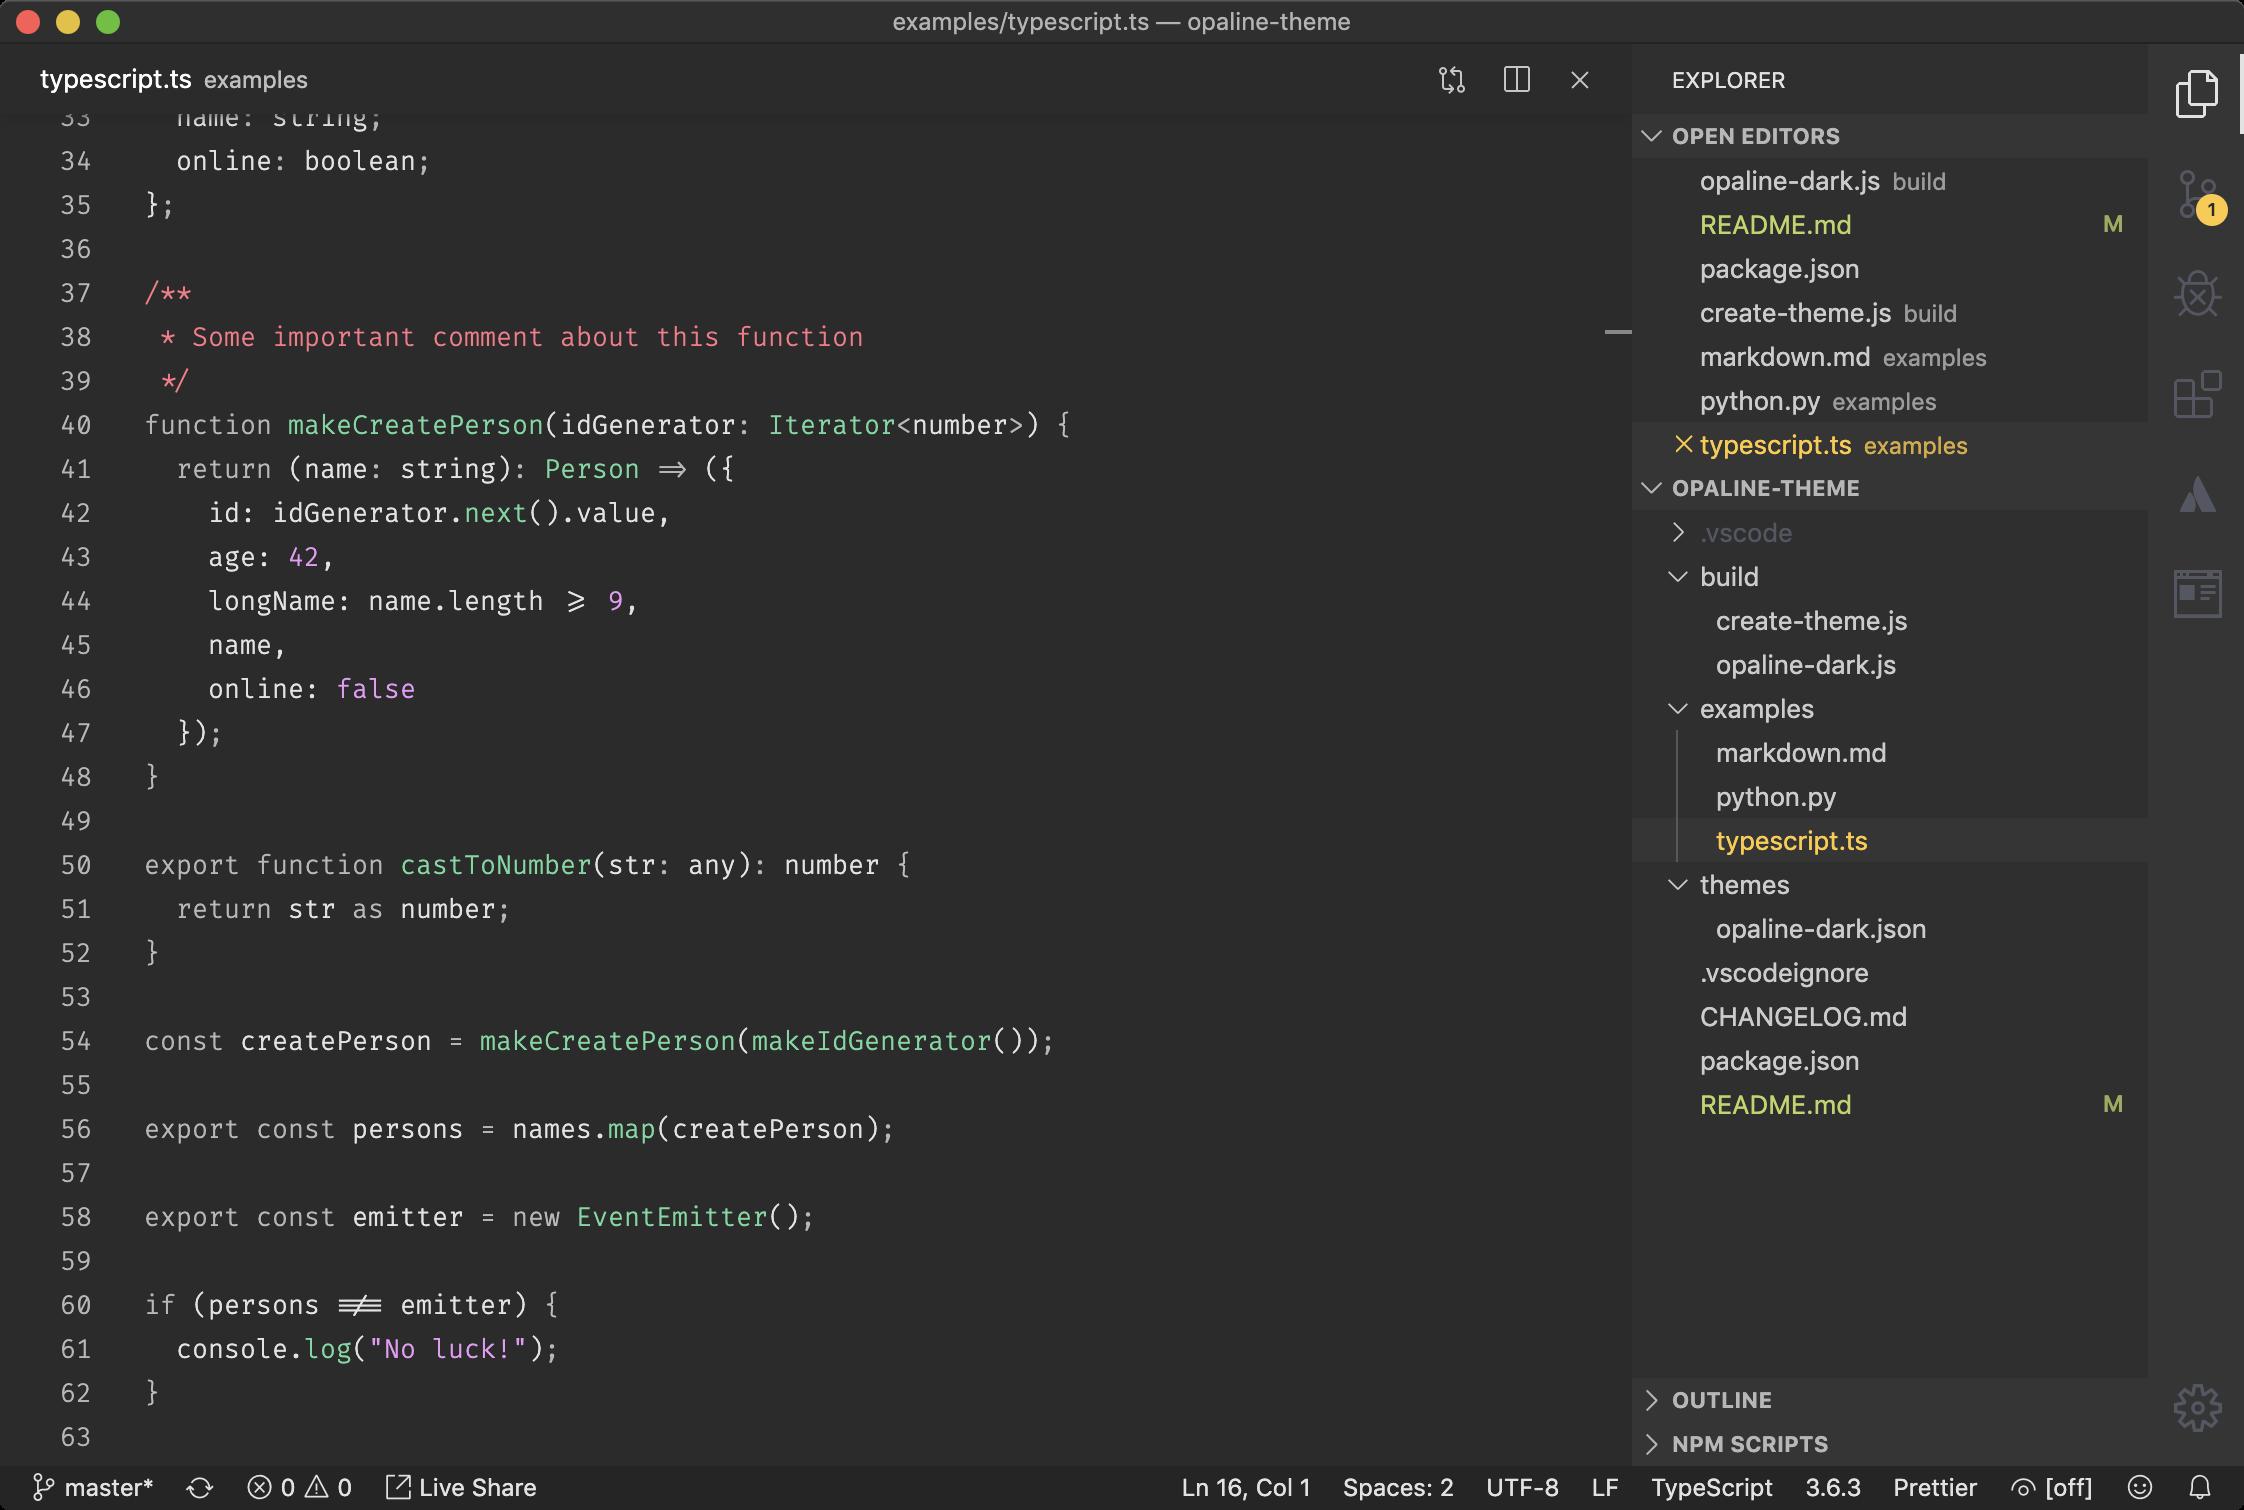 TypeScript / JavaScript